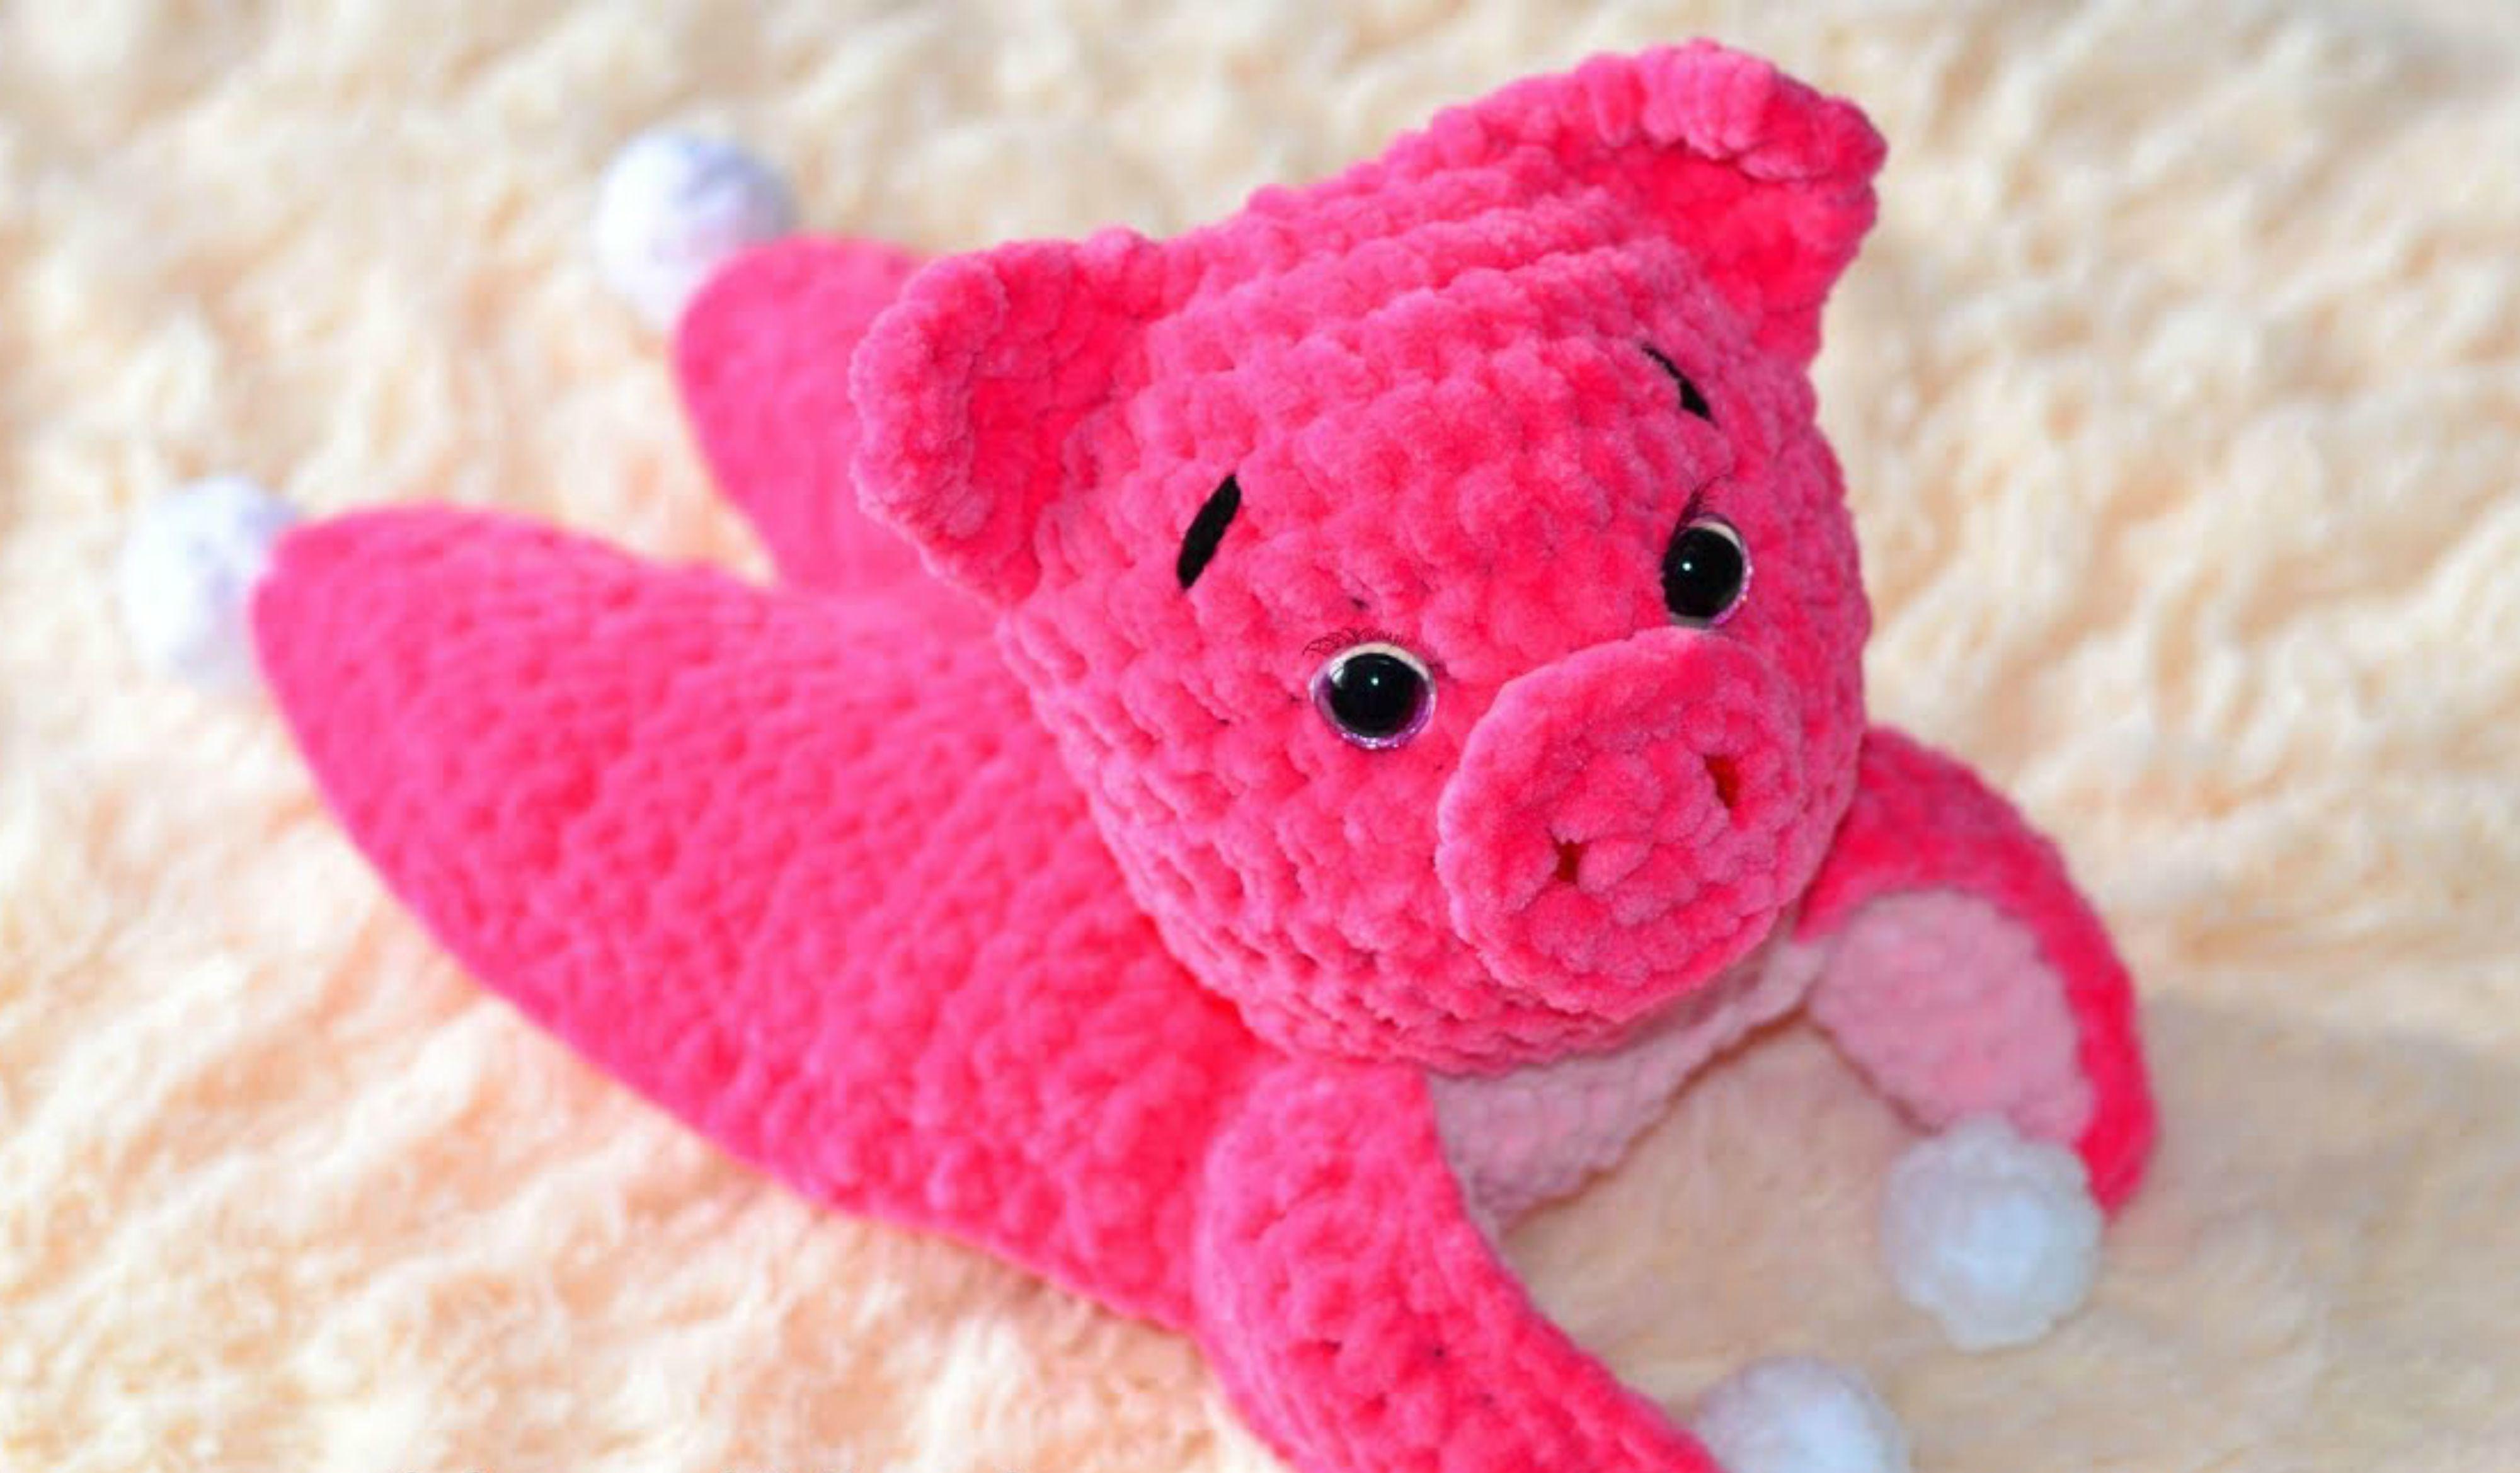 Crochet Pig PATTERN Amigurumi piglet pattern pdf tutorial | Etsy | 2338x4000